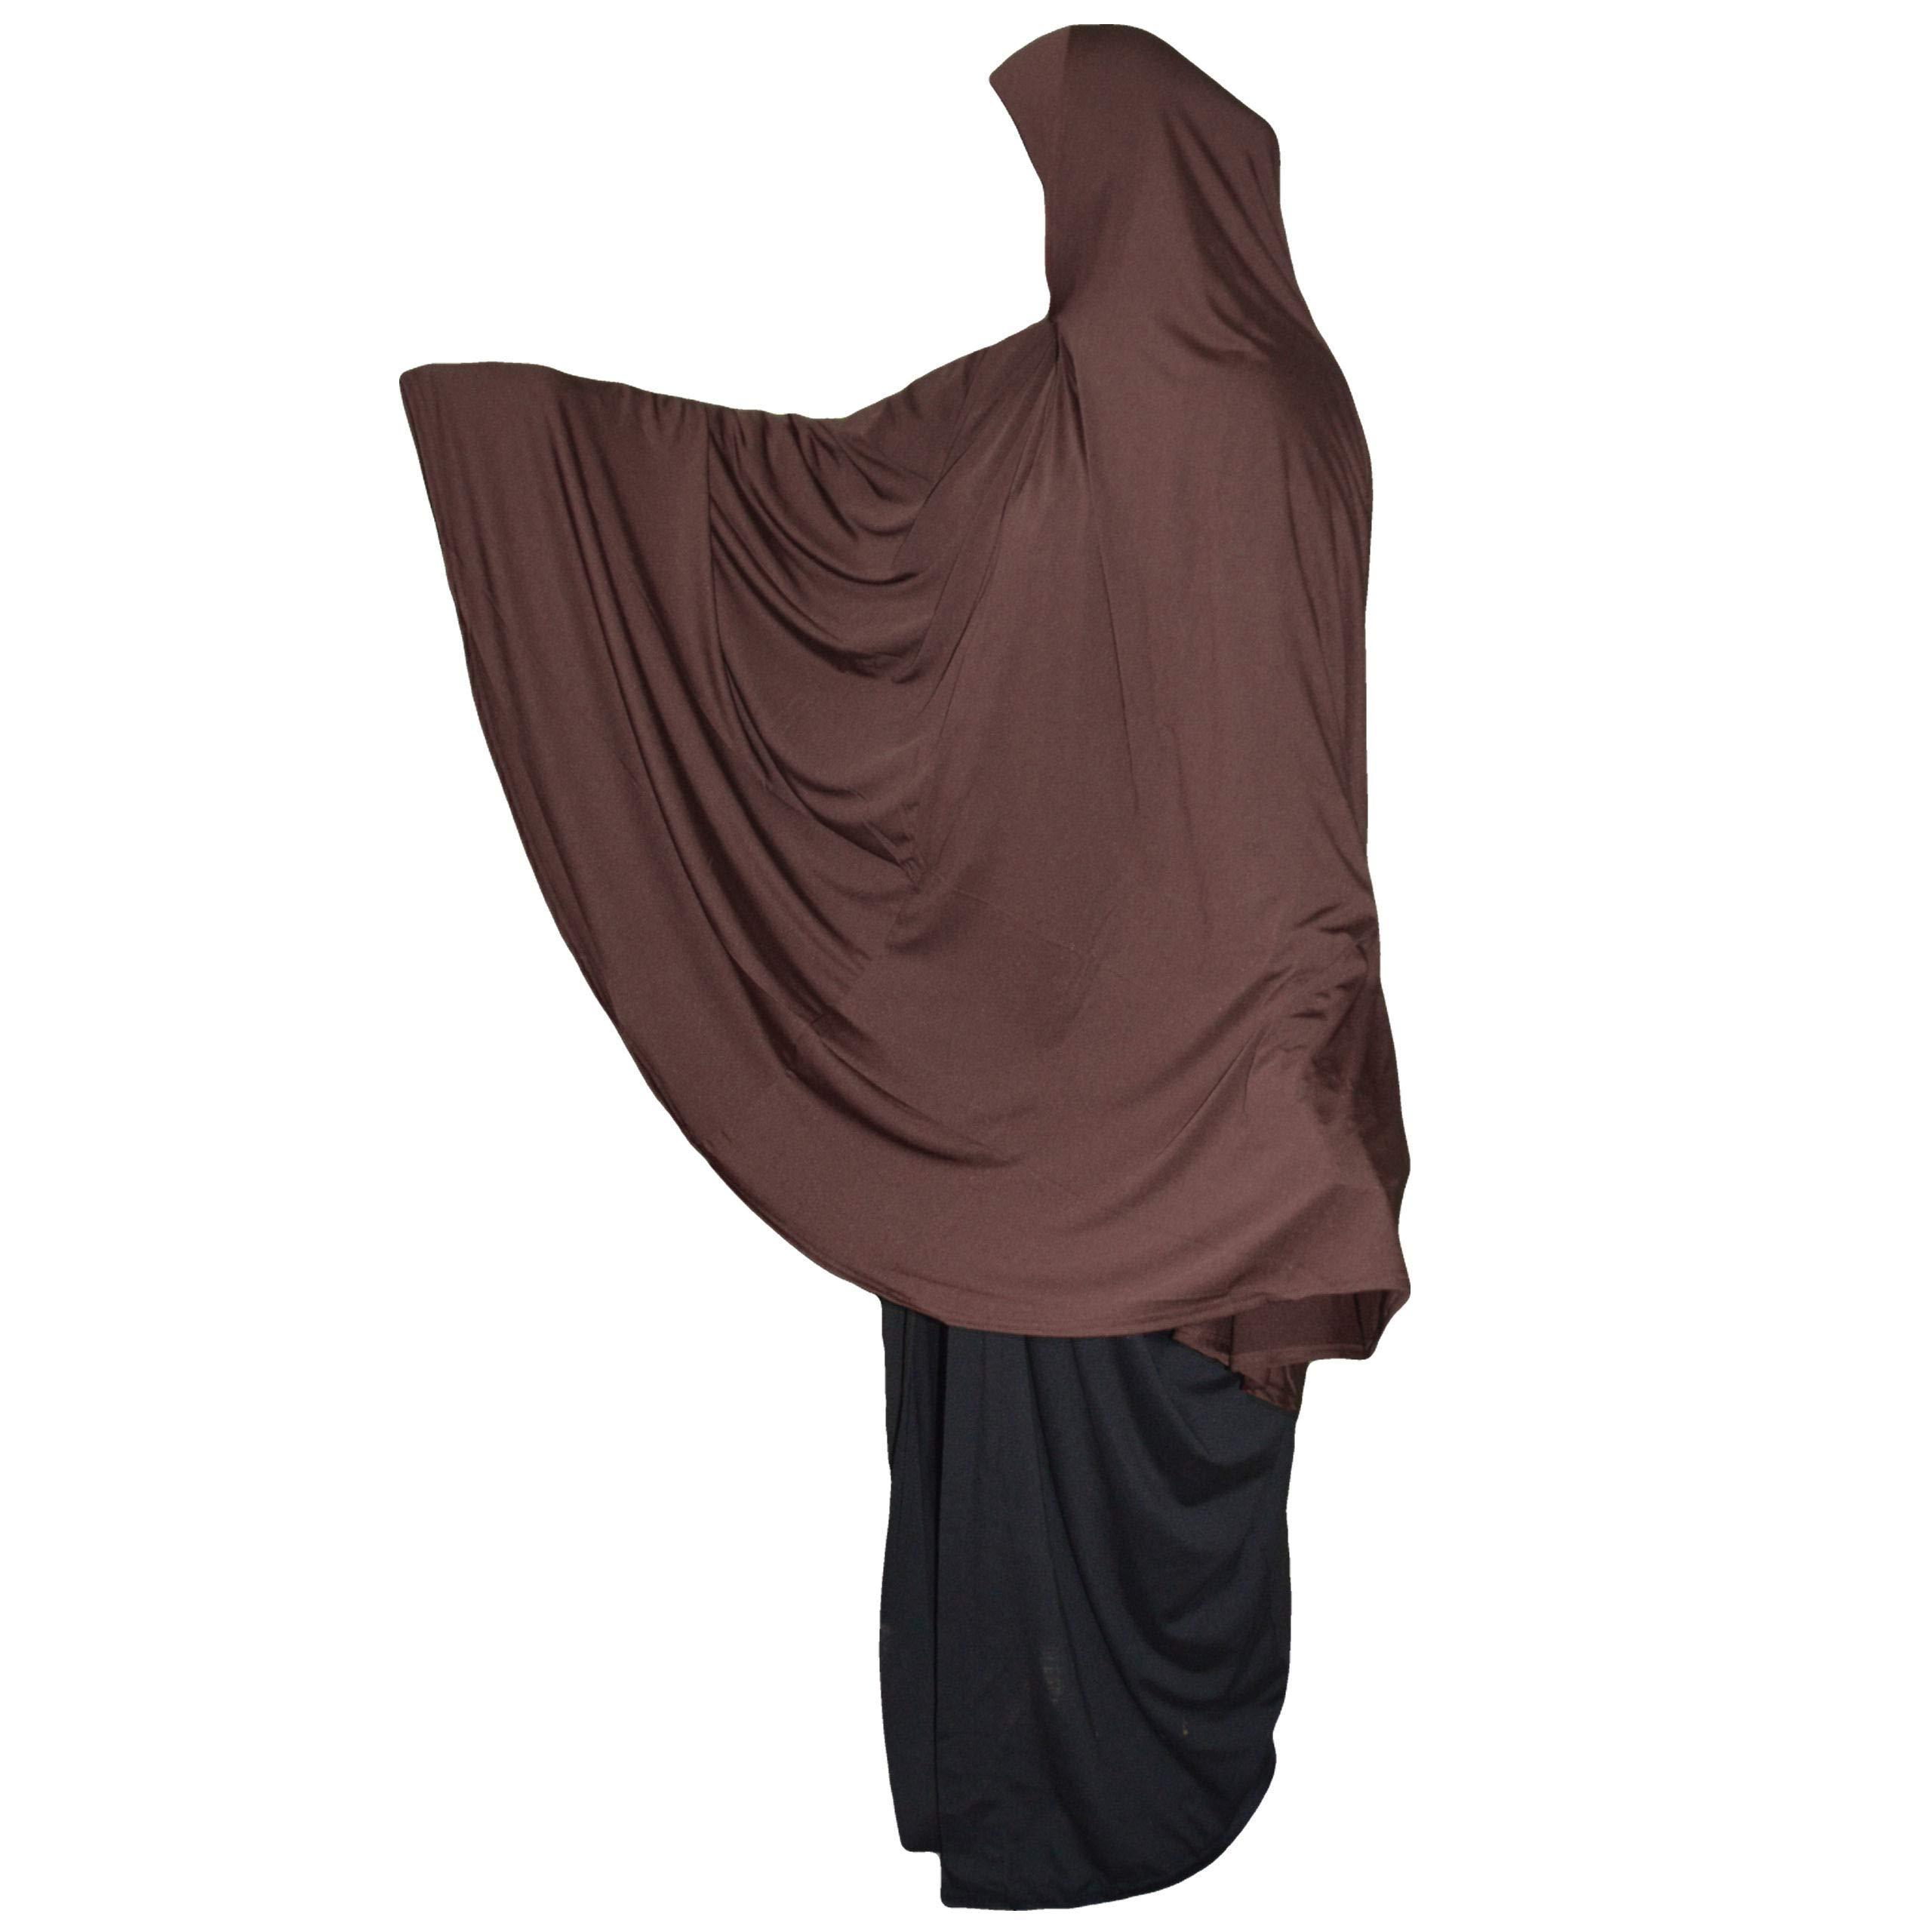 XL long Khimar ready made Hijab for Muslimah one piece stretchy headscarf Lycra material Chadors Arabia Islamic Prayer Dress Muslim Clothes Shawls Body Cover